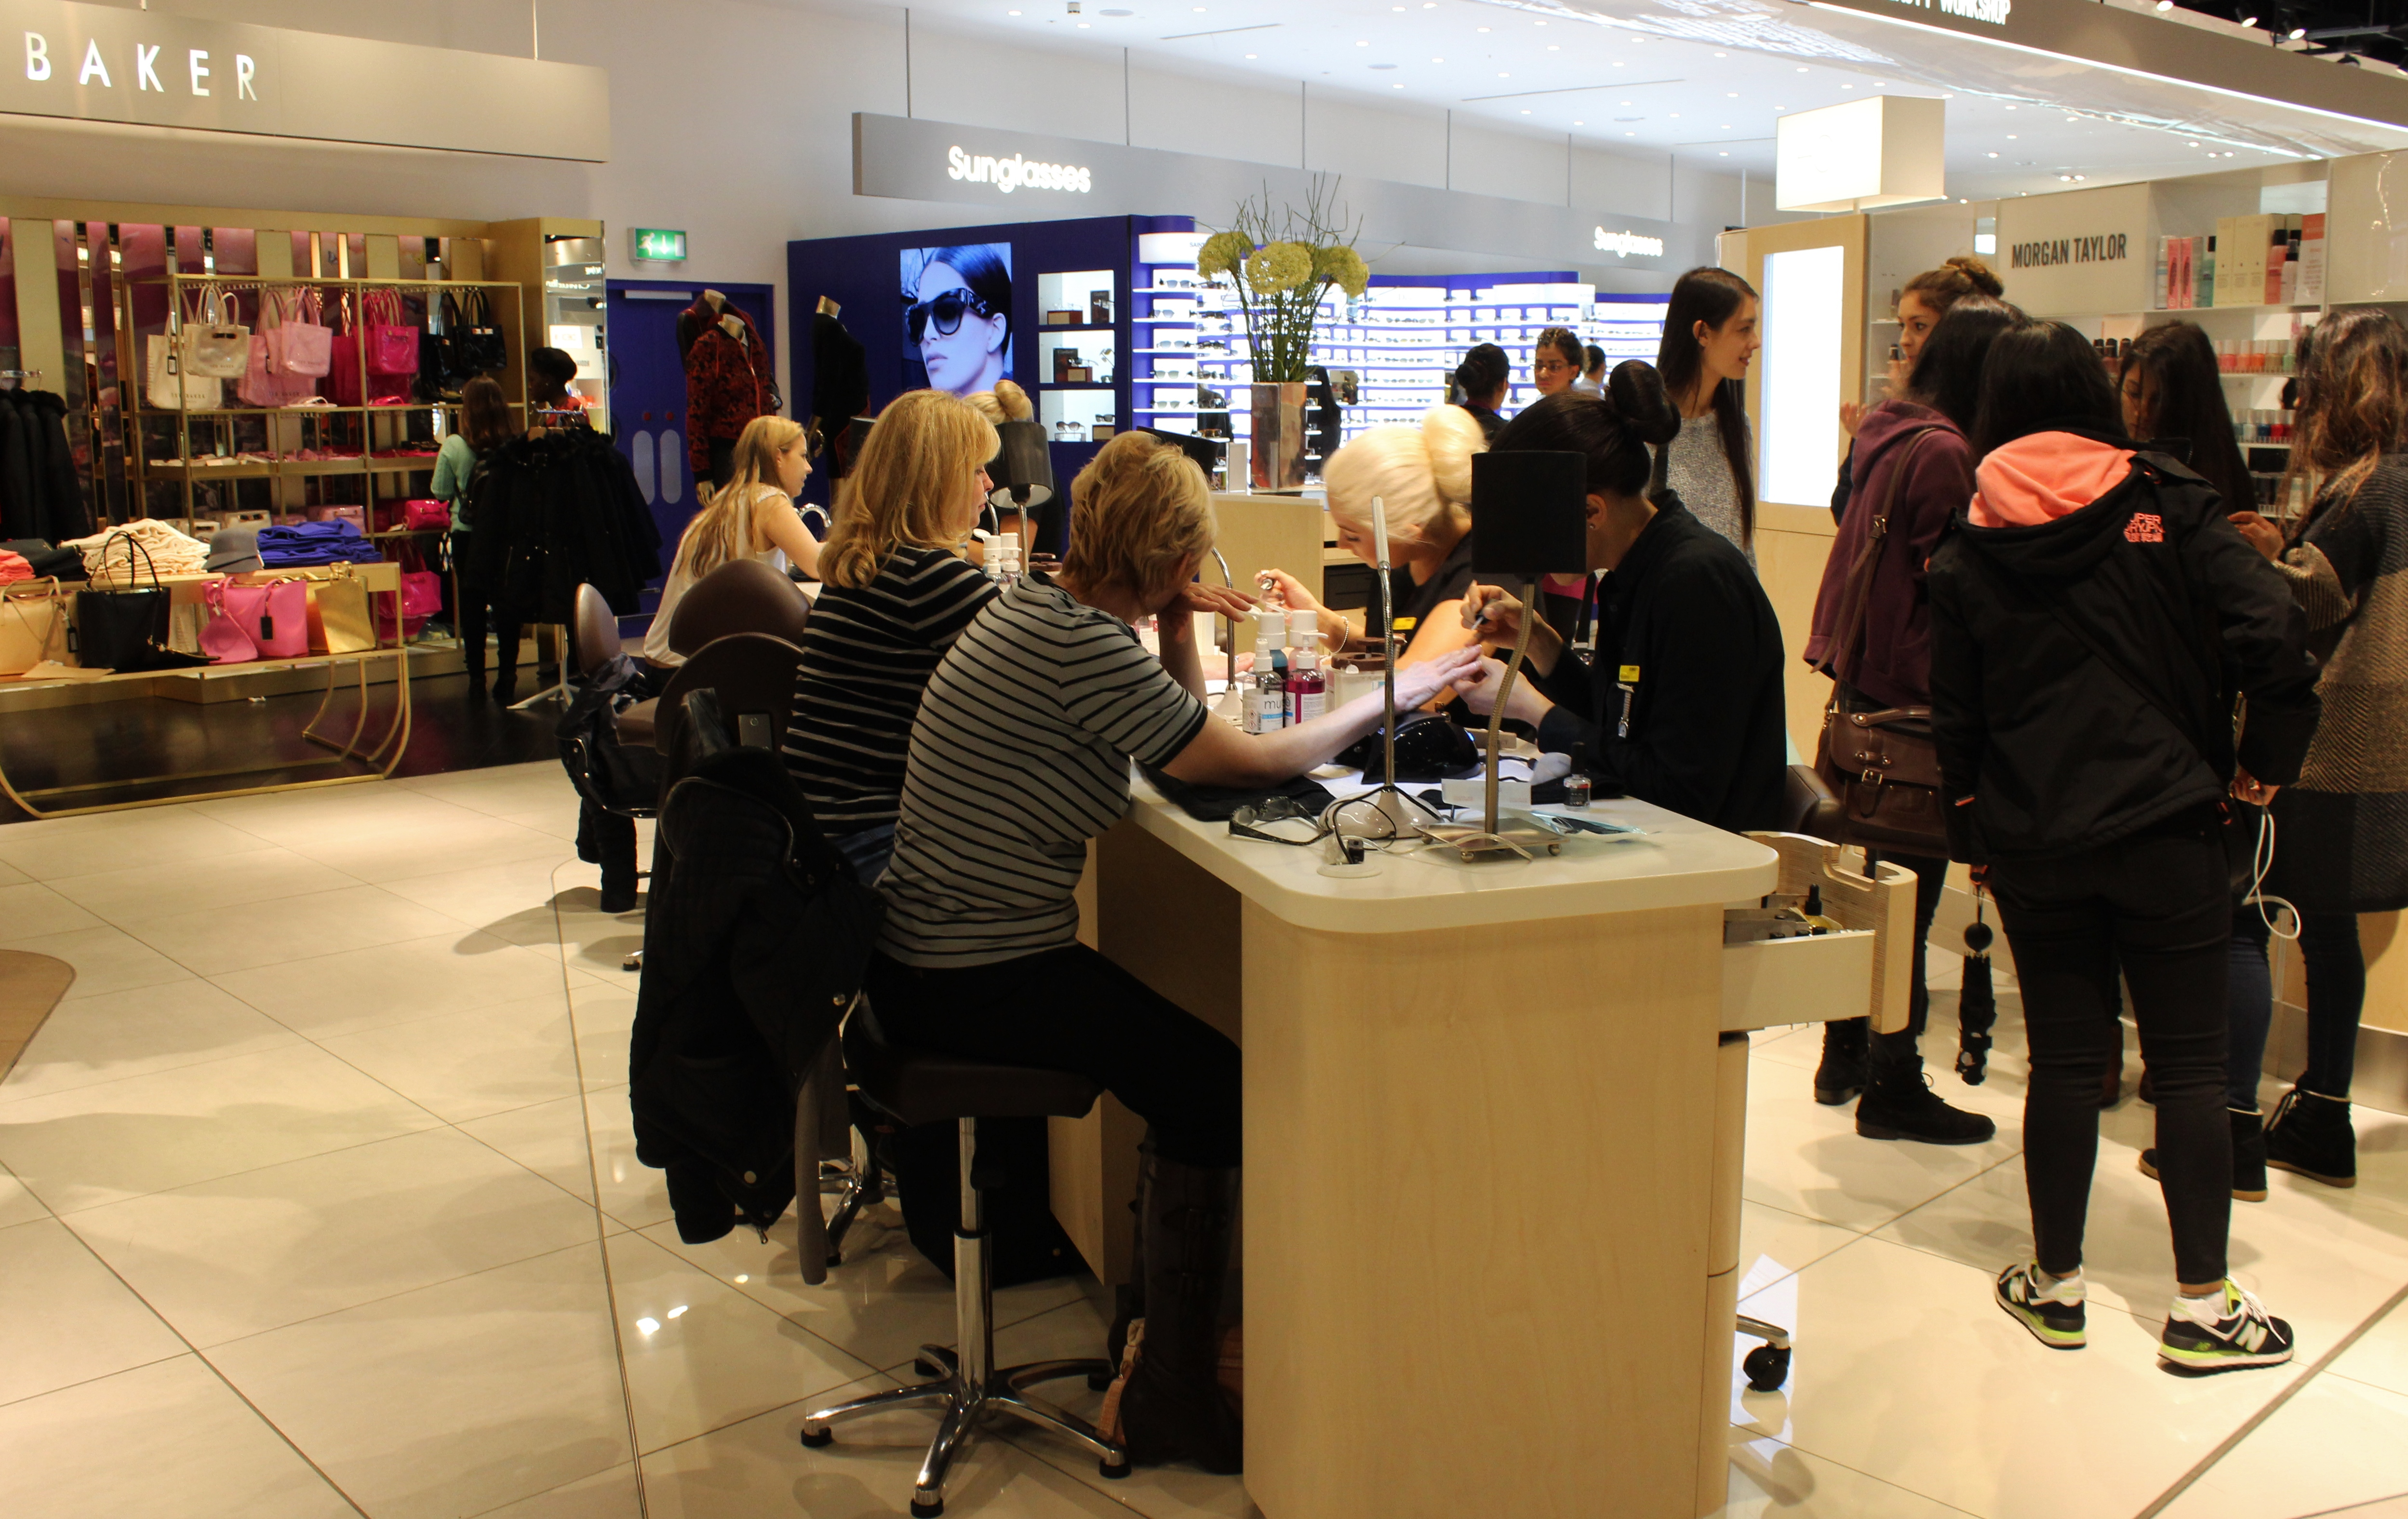 Hc lux spa selfridges birmingham review xameliax for Lux salon and spa